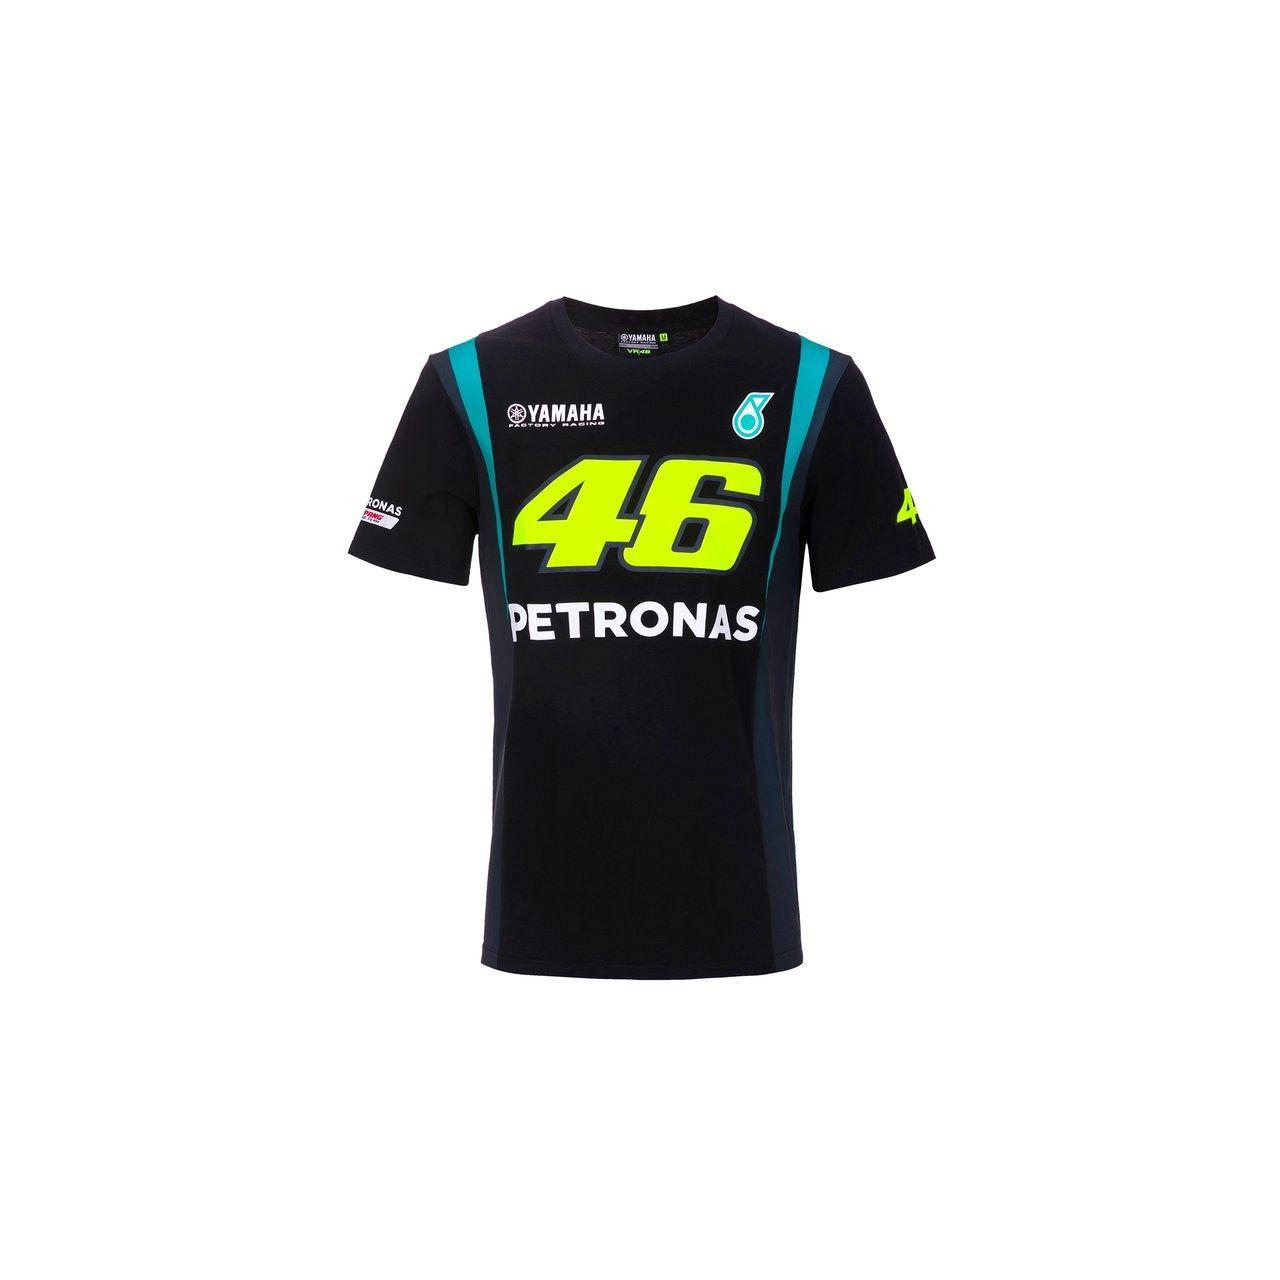 YAMAHA T-shirt Homme Racing Petronas Team VR46 2021